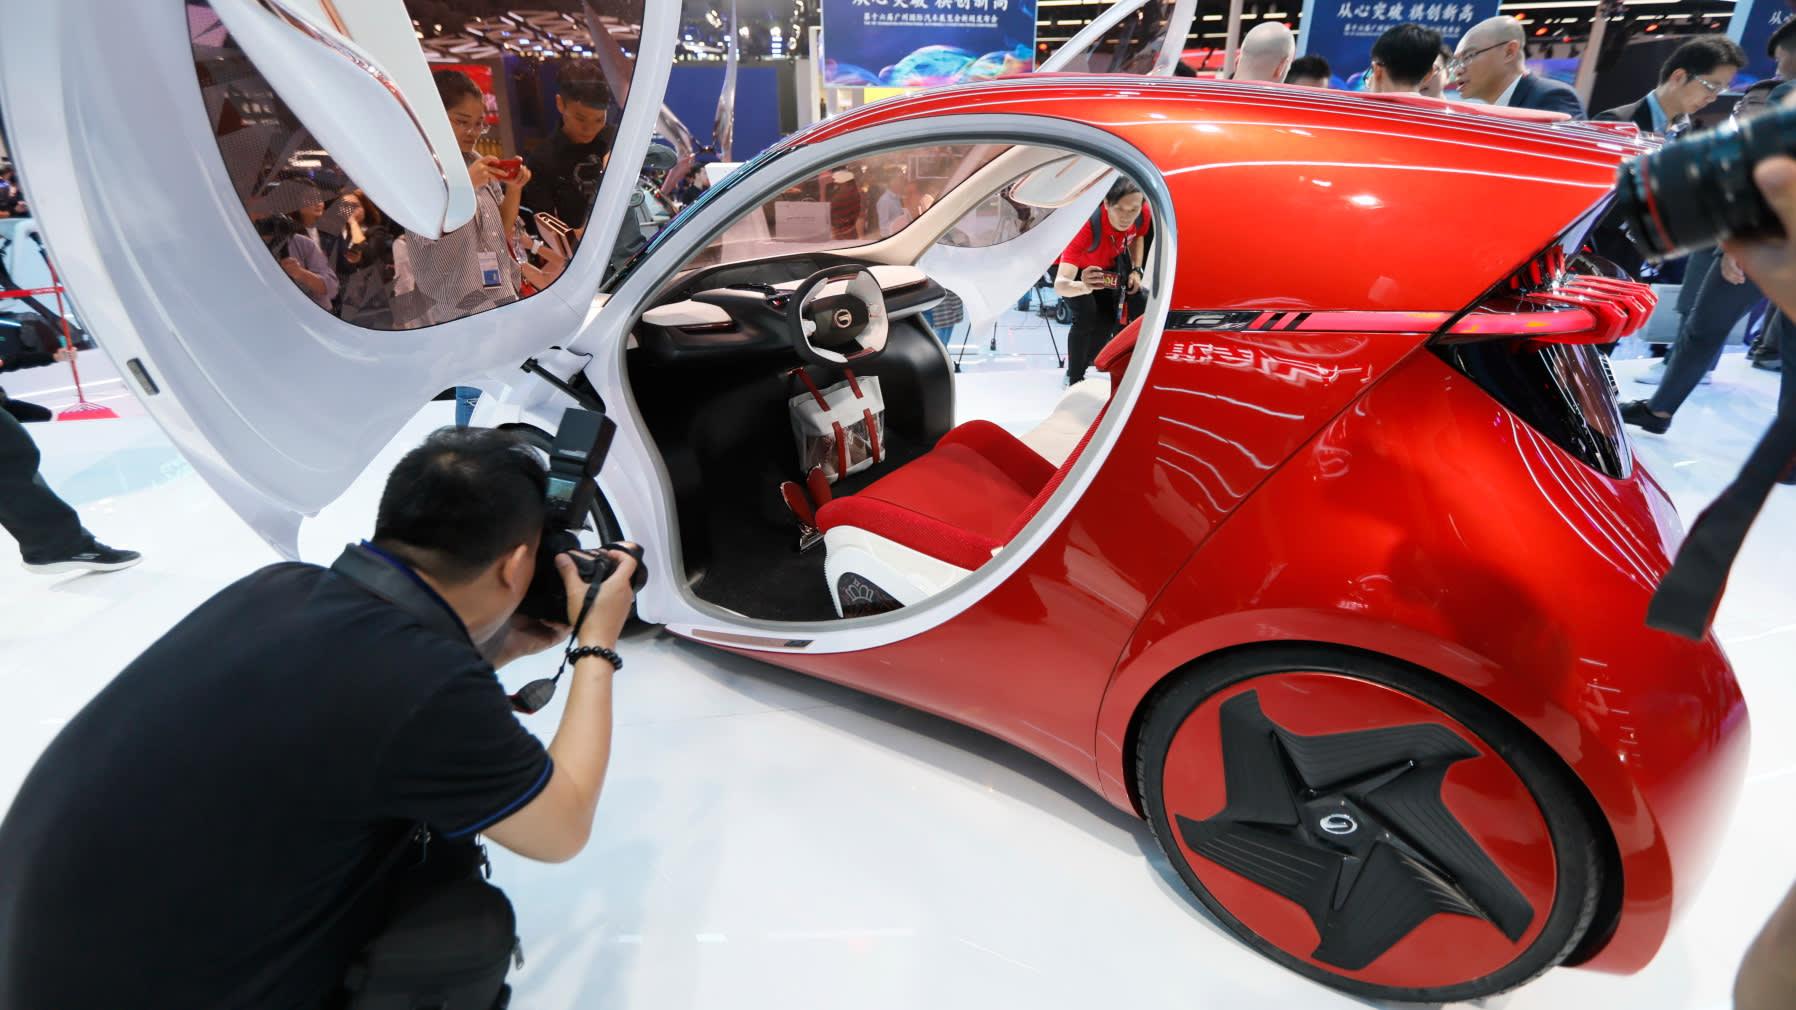 https://s3-ap-northeast-1.amazonaws.com/psh-ex-ftnikkei-3937bb4/images/8/5/6/2/16722658-1-eng-GB/trumpchi guangzhou concept car.jpg (1796×1010)